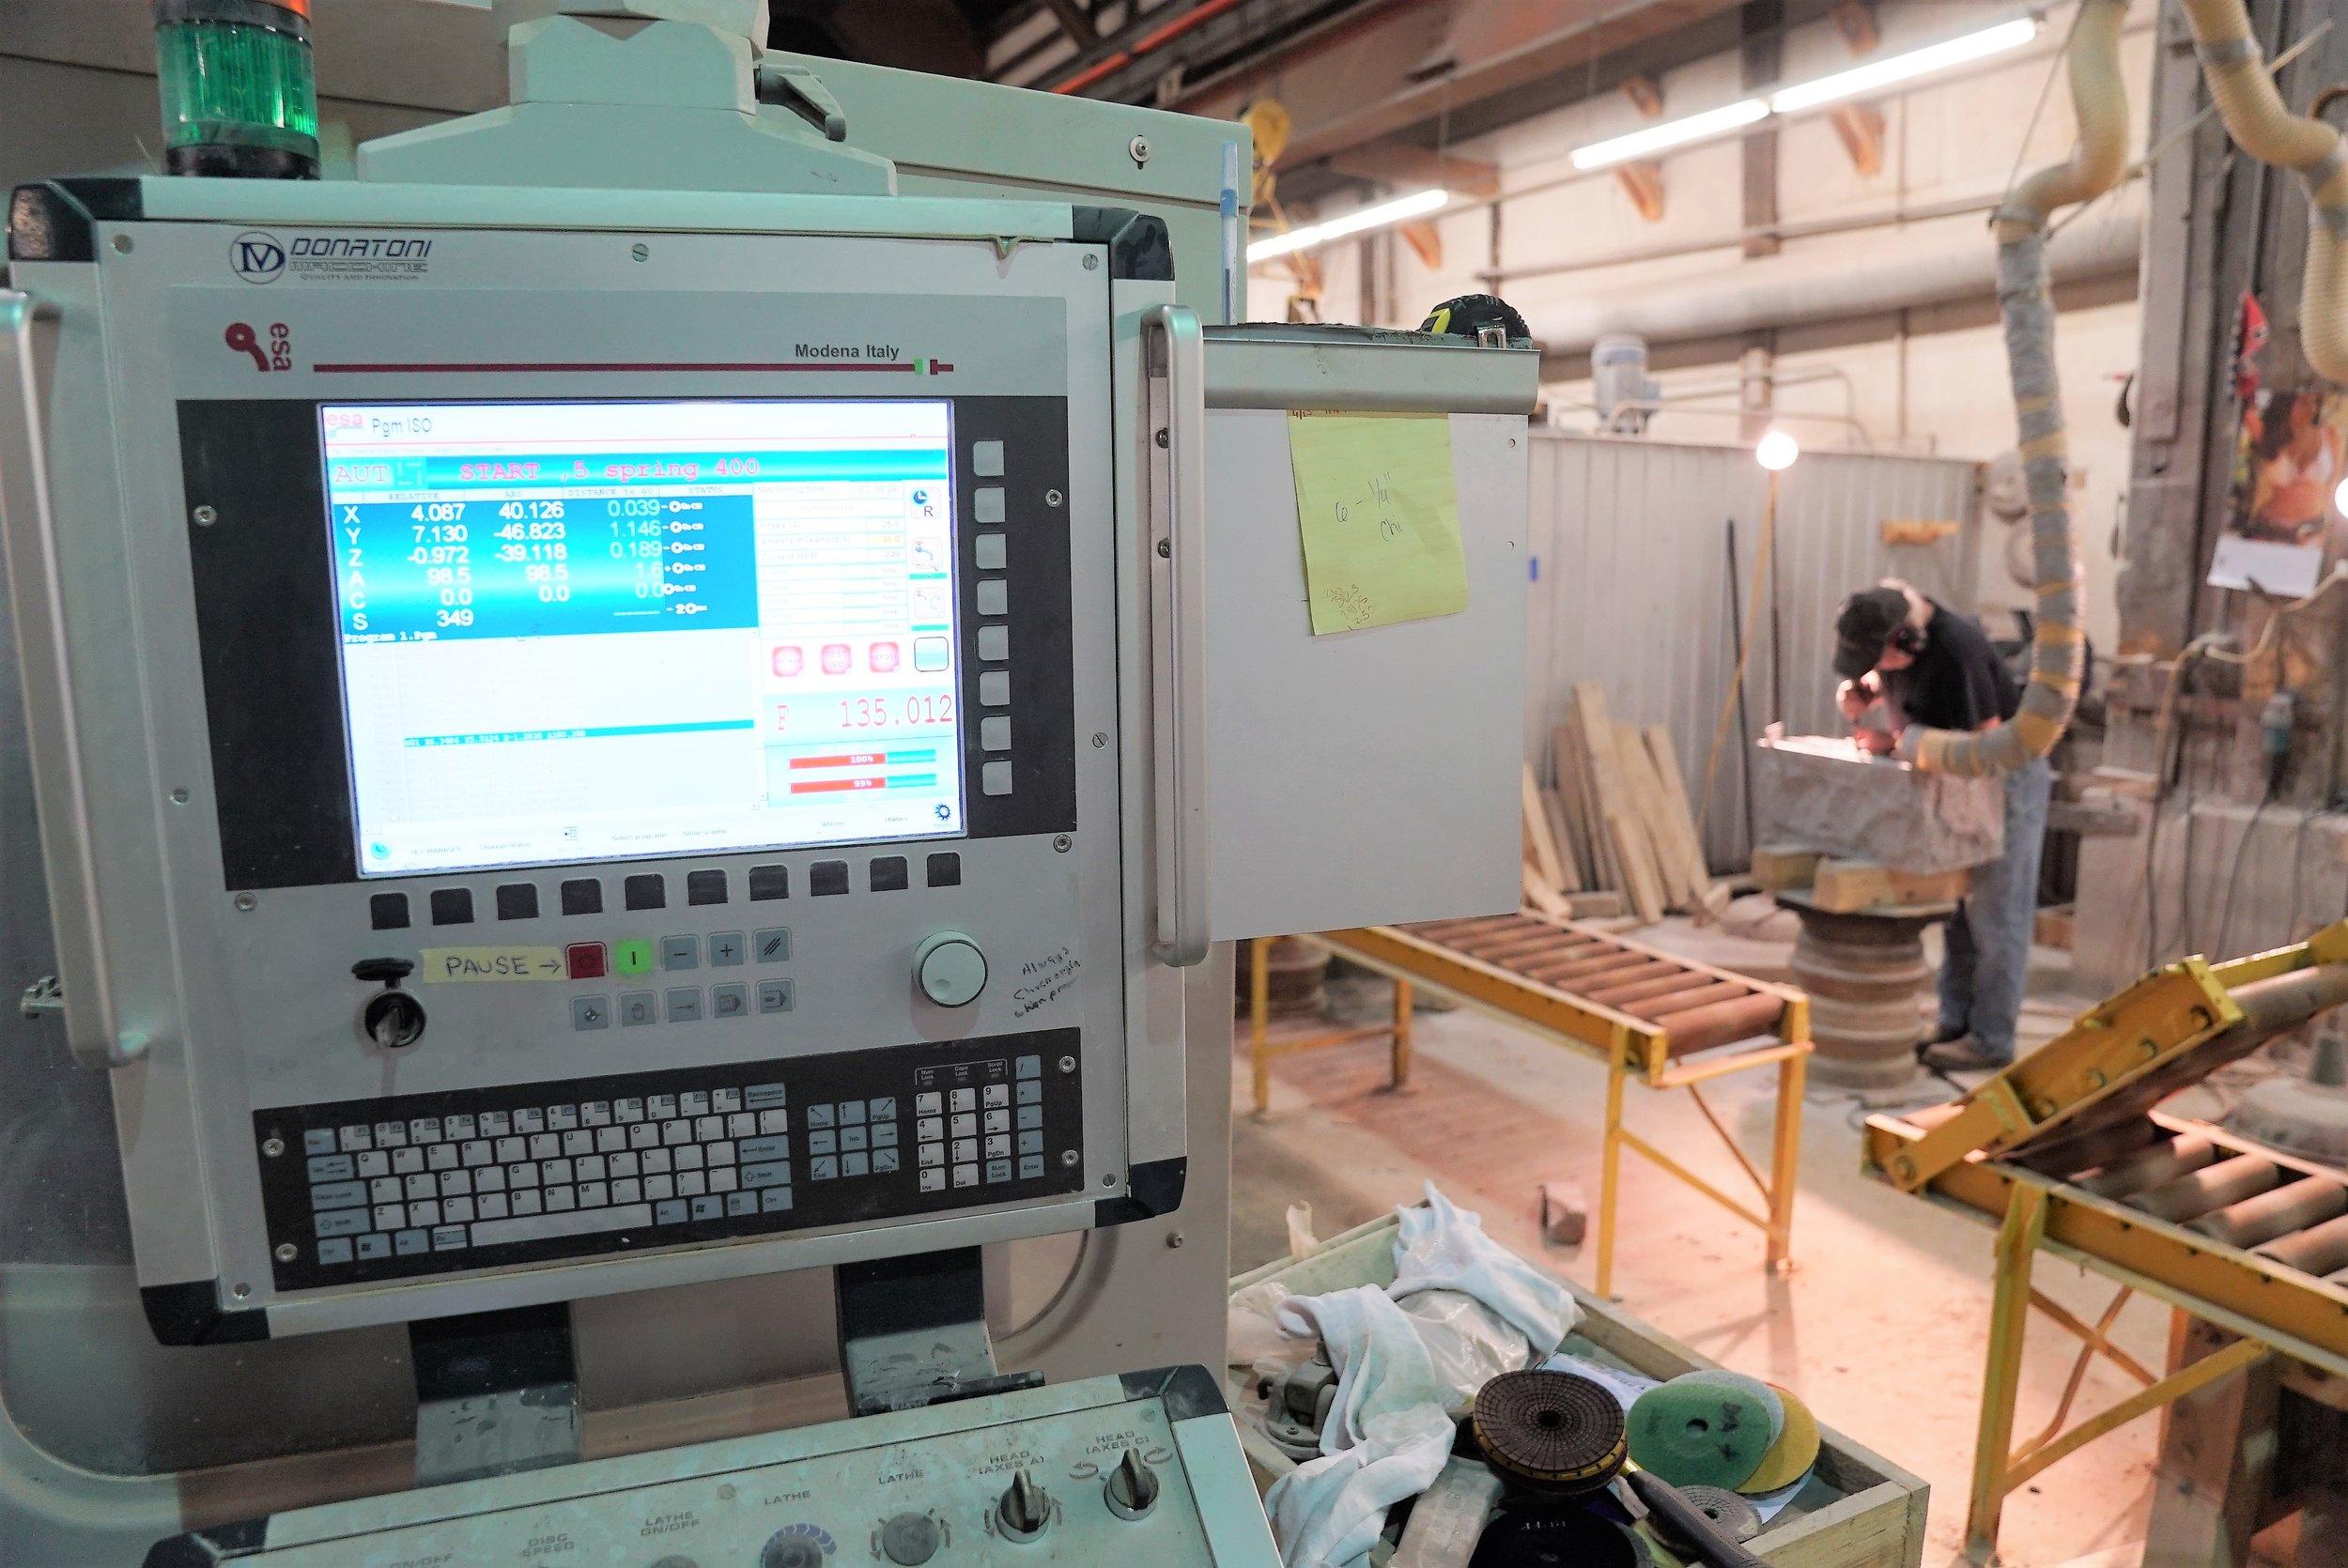 The polishing machine's control panel. It looks complicated!